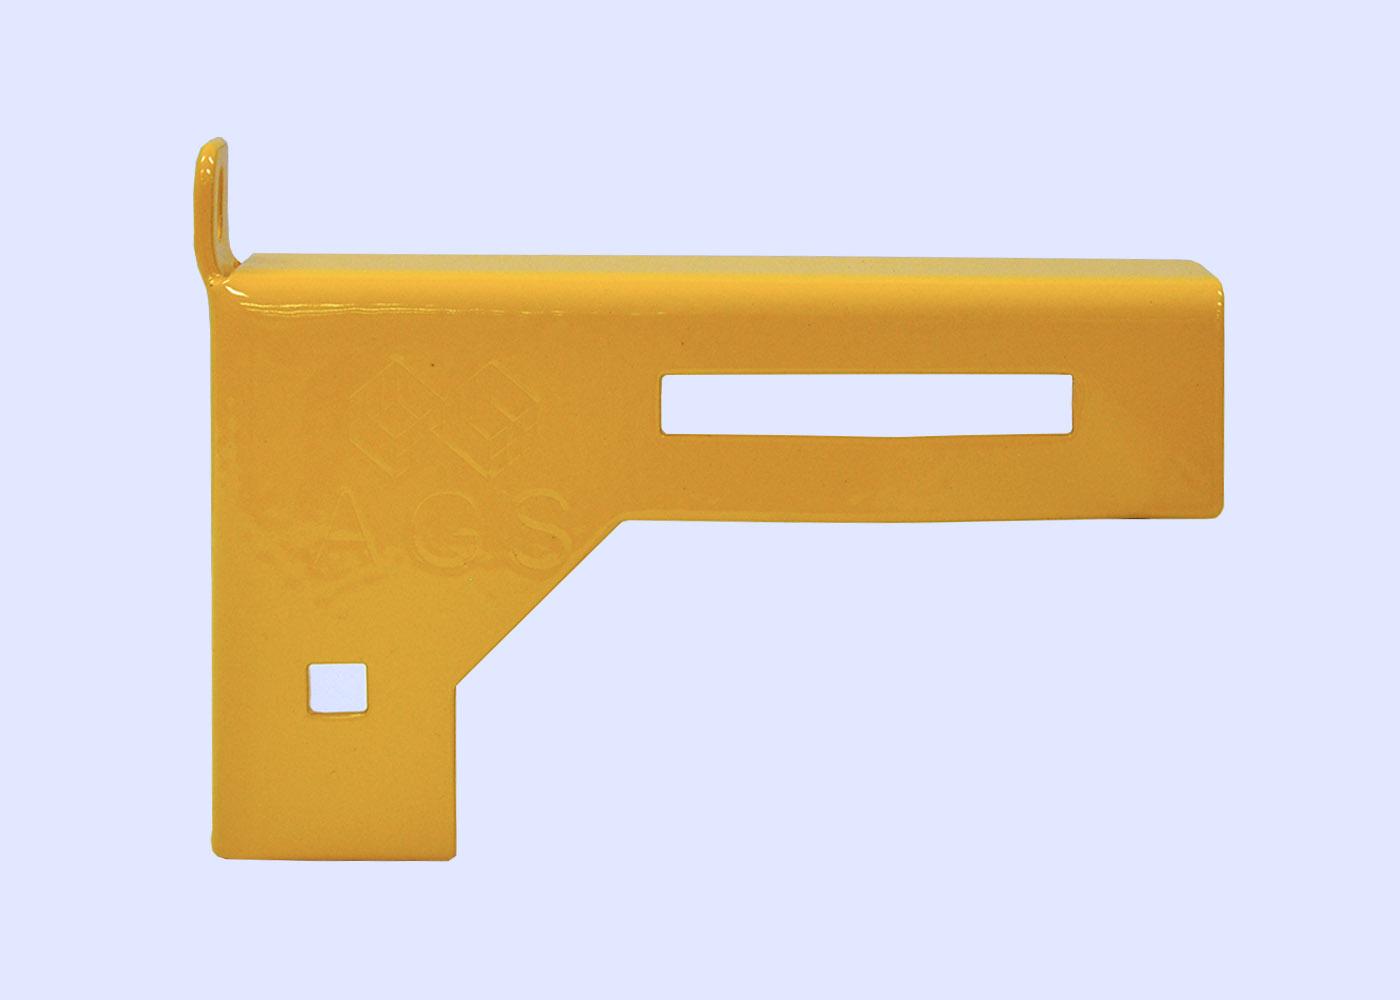 A12851-top-lh-corner-bracket-1400w